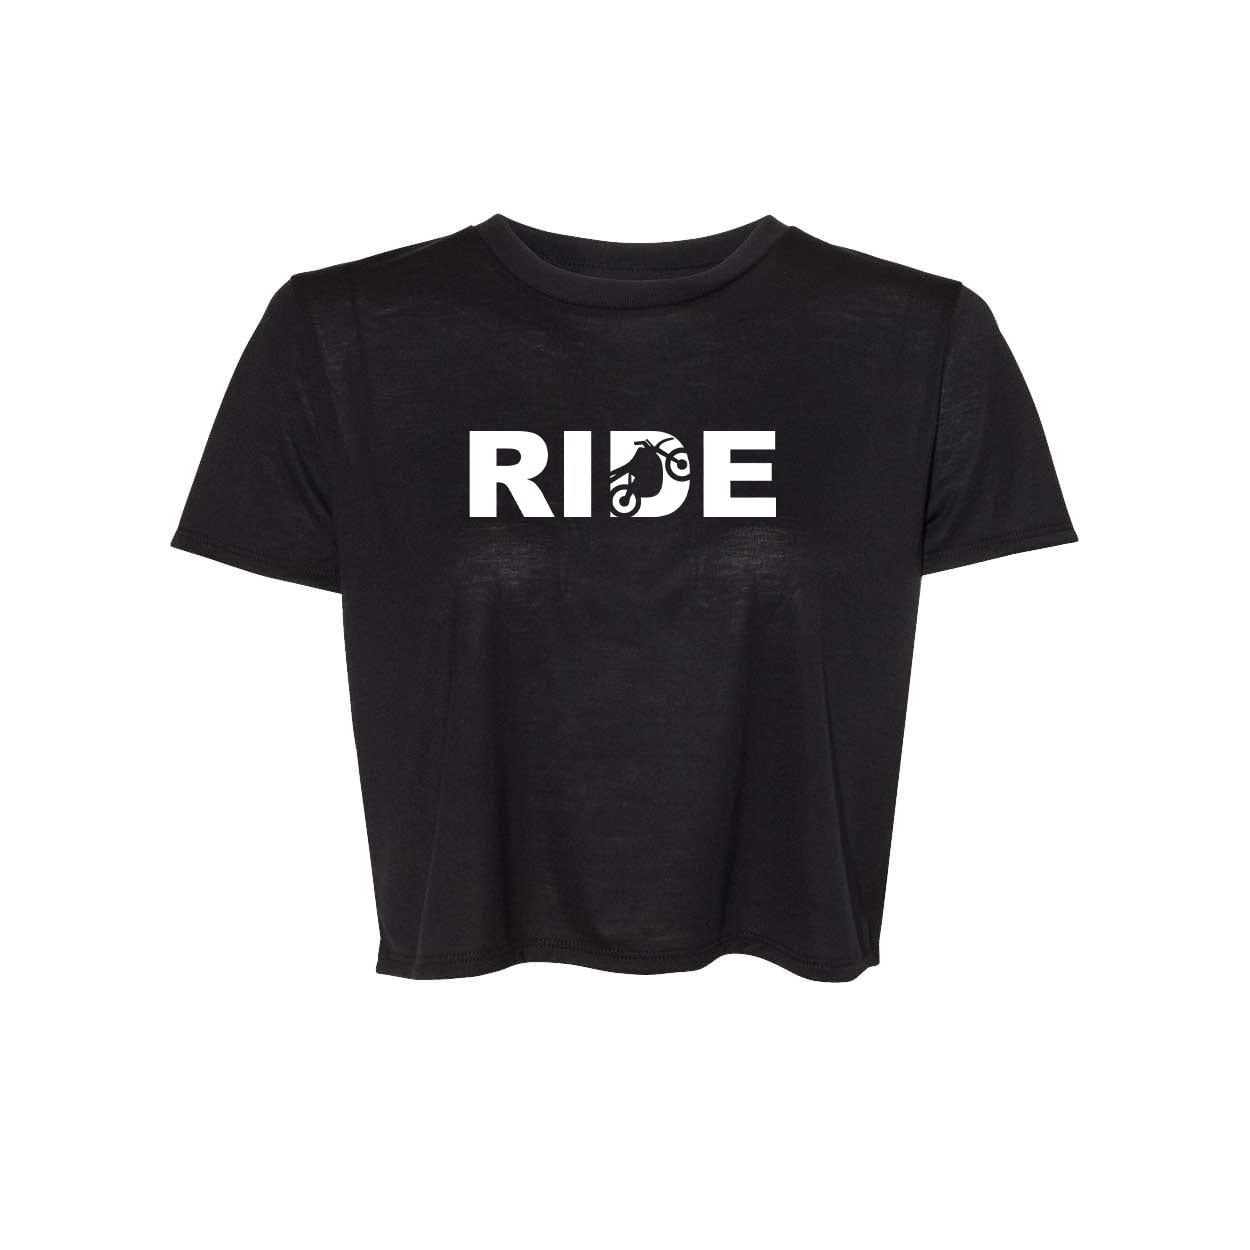 Ride Moto Logo Classic Womens Flowy Cropped Tee Black (White Logo)